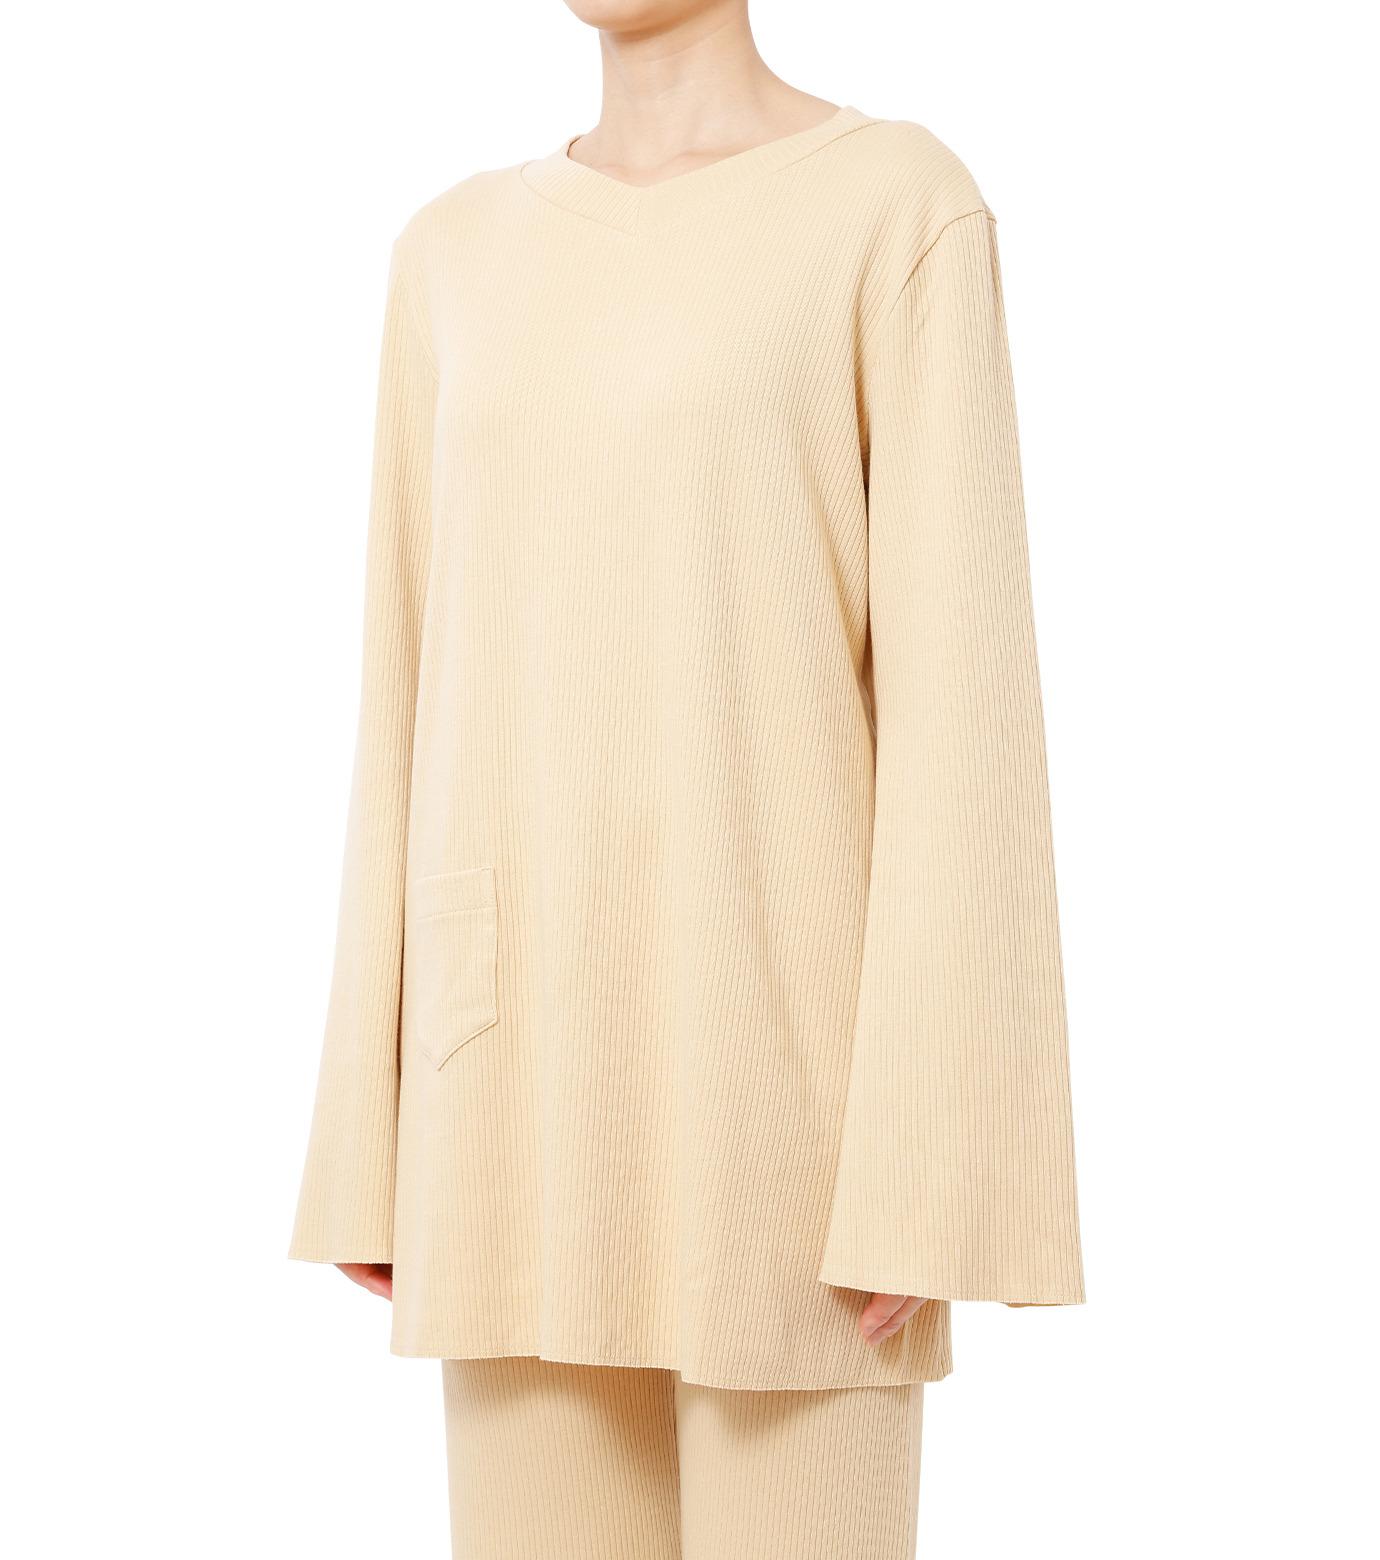 AKANE UTSUNOMIYA(アカネウツノミヤ)のLong Sleeve Rib Knit Pullover-LIGHT BEIGE(ニット/knit)-W16FCT032001-51 拡大詳細画像1